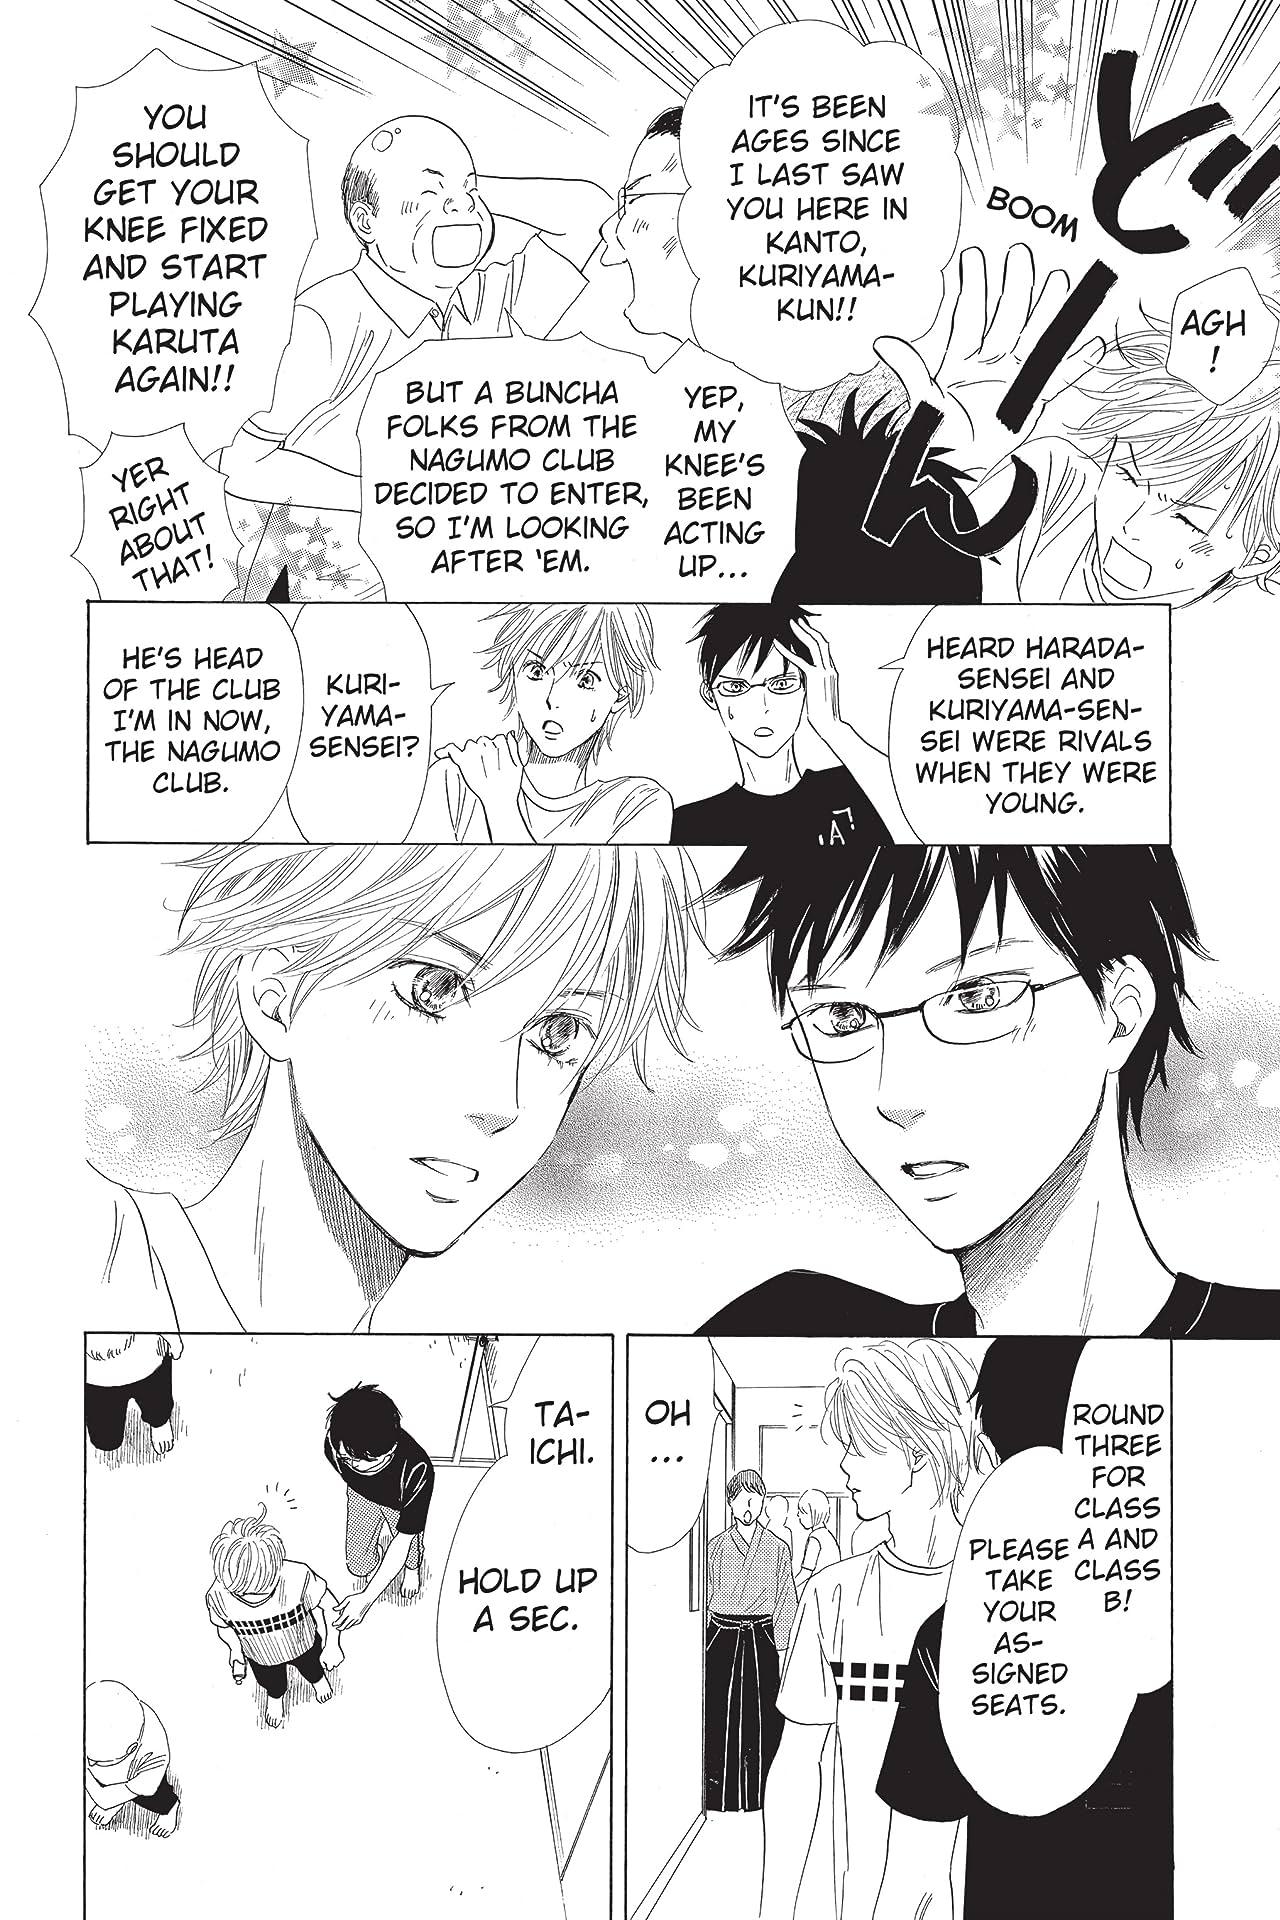 Chihayafuru Vol. 7